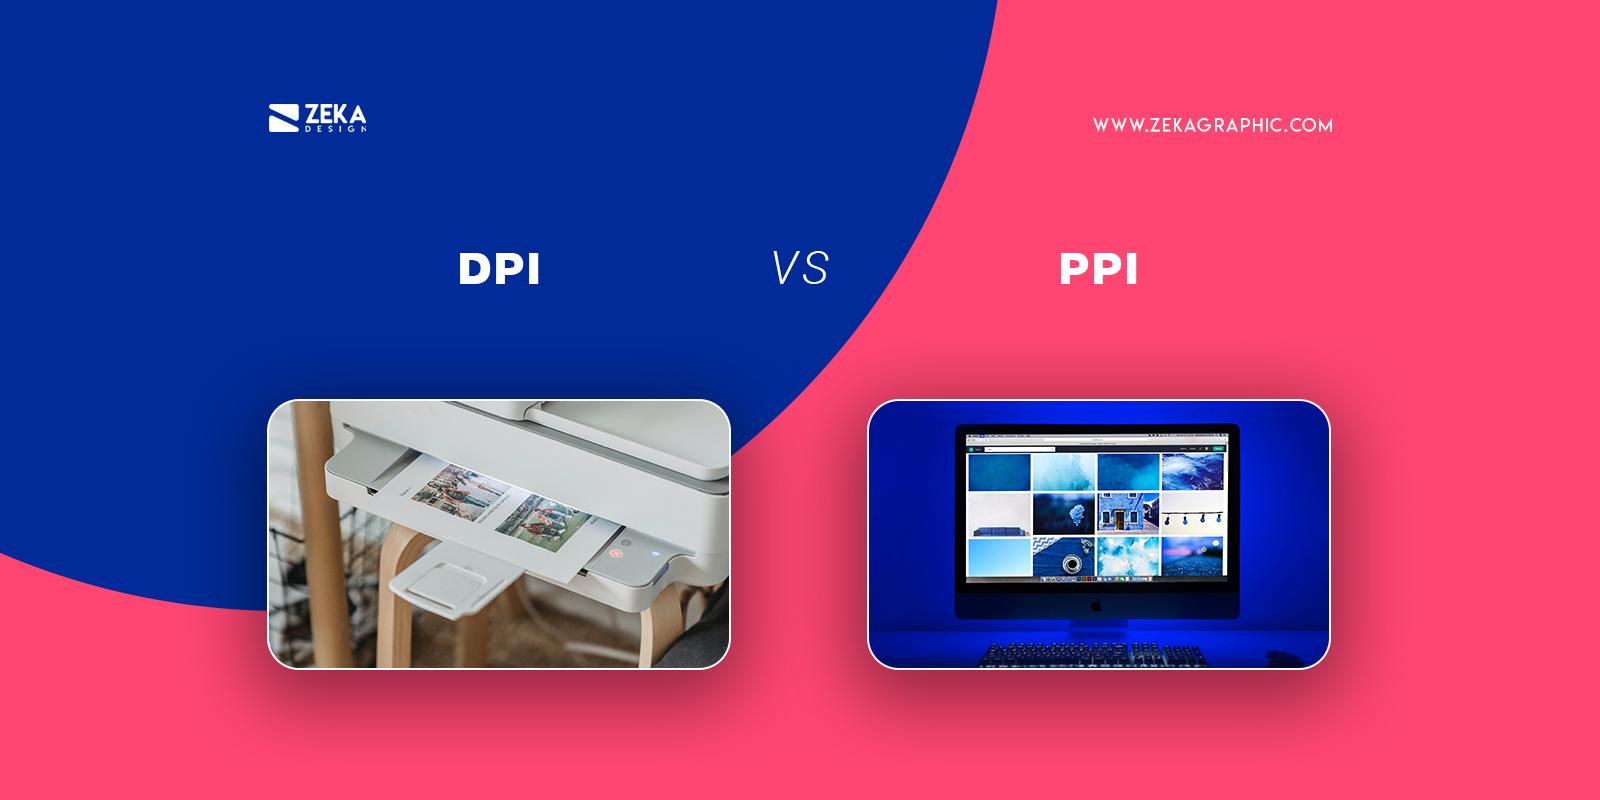 DPI vs PPI Graphic Design Terms Explained